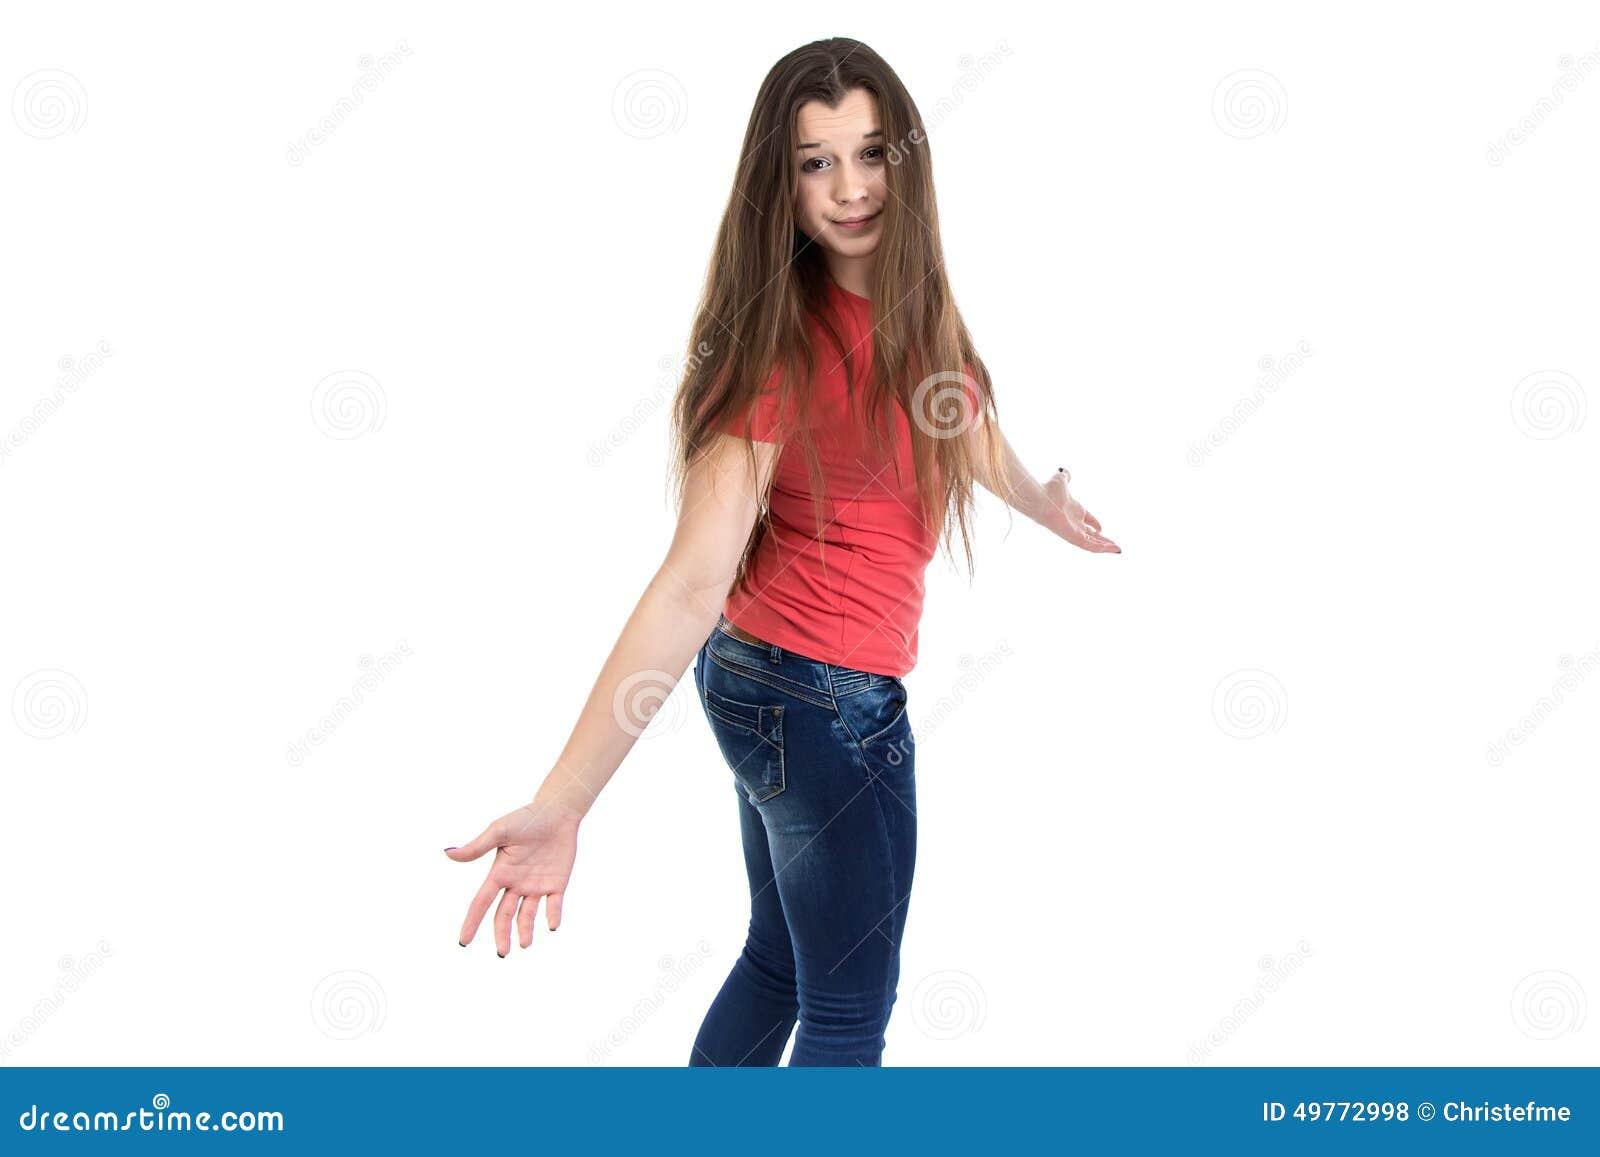 Confused teen